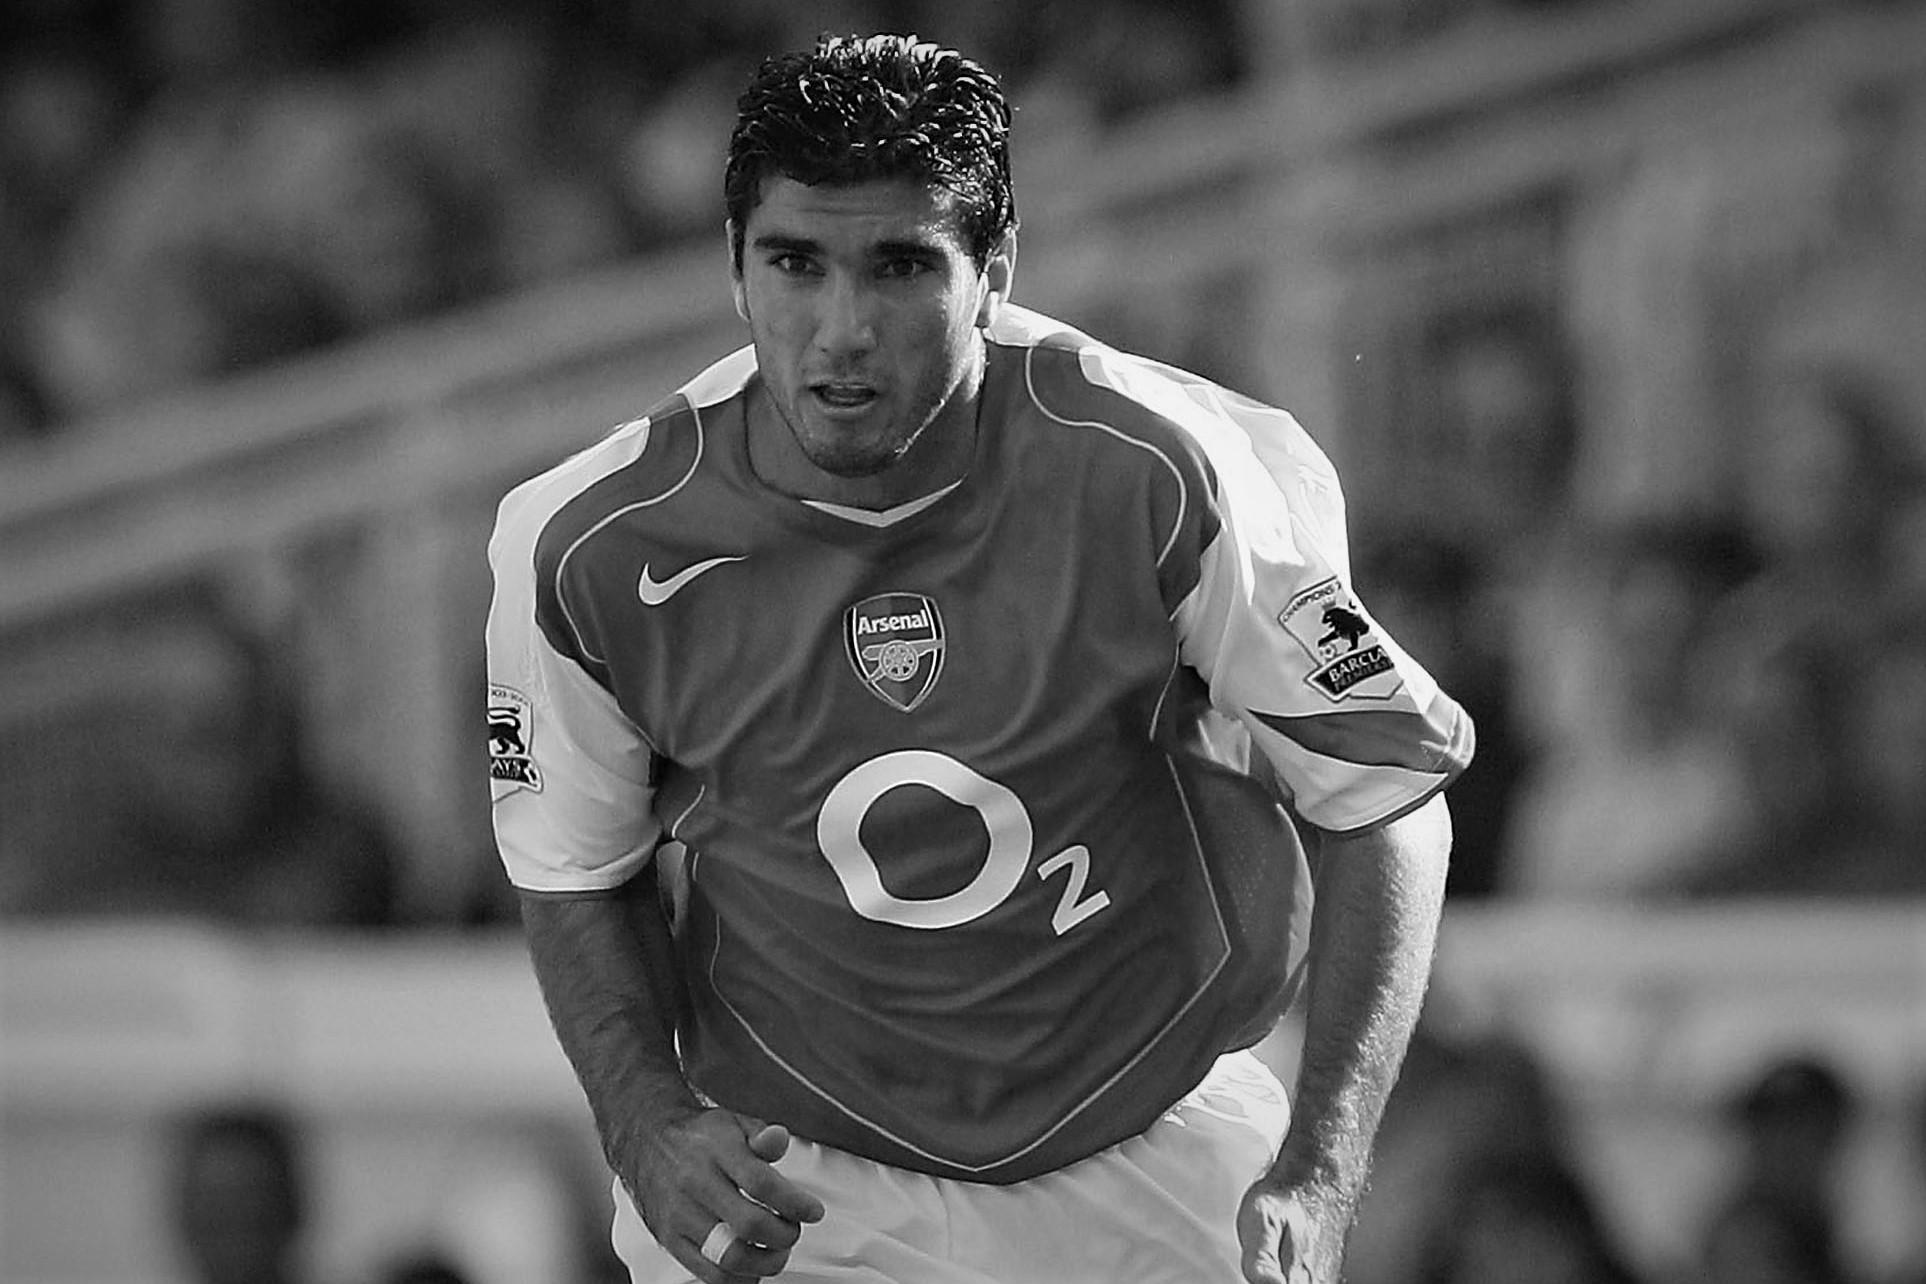 Former Arsenal forward Reyes passes away